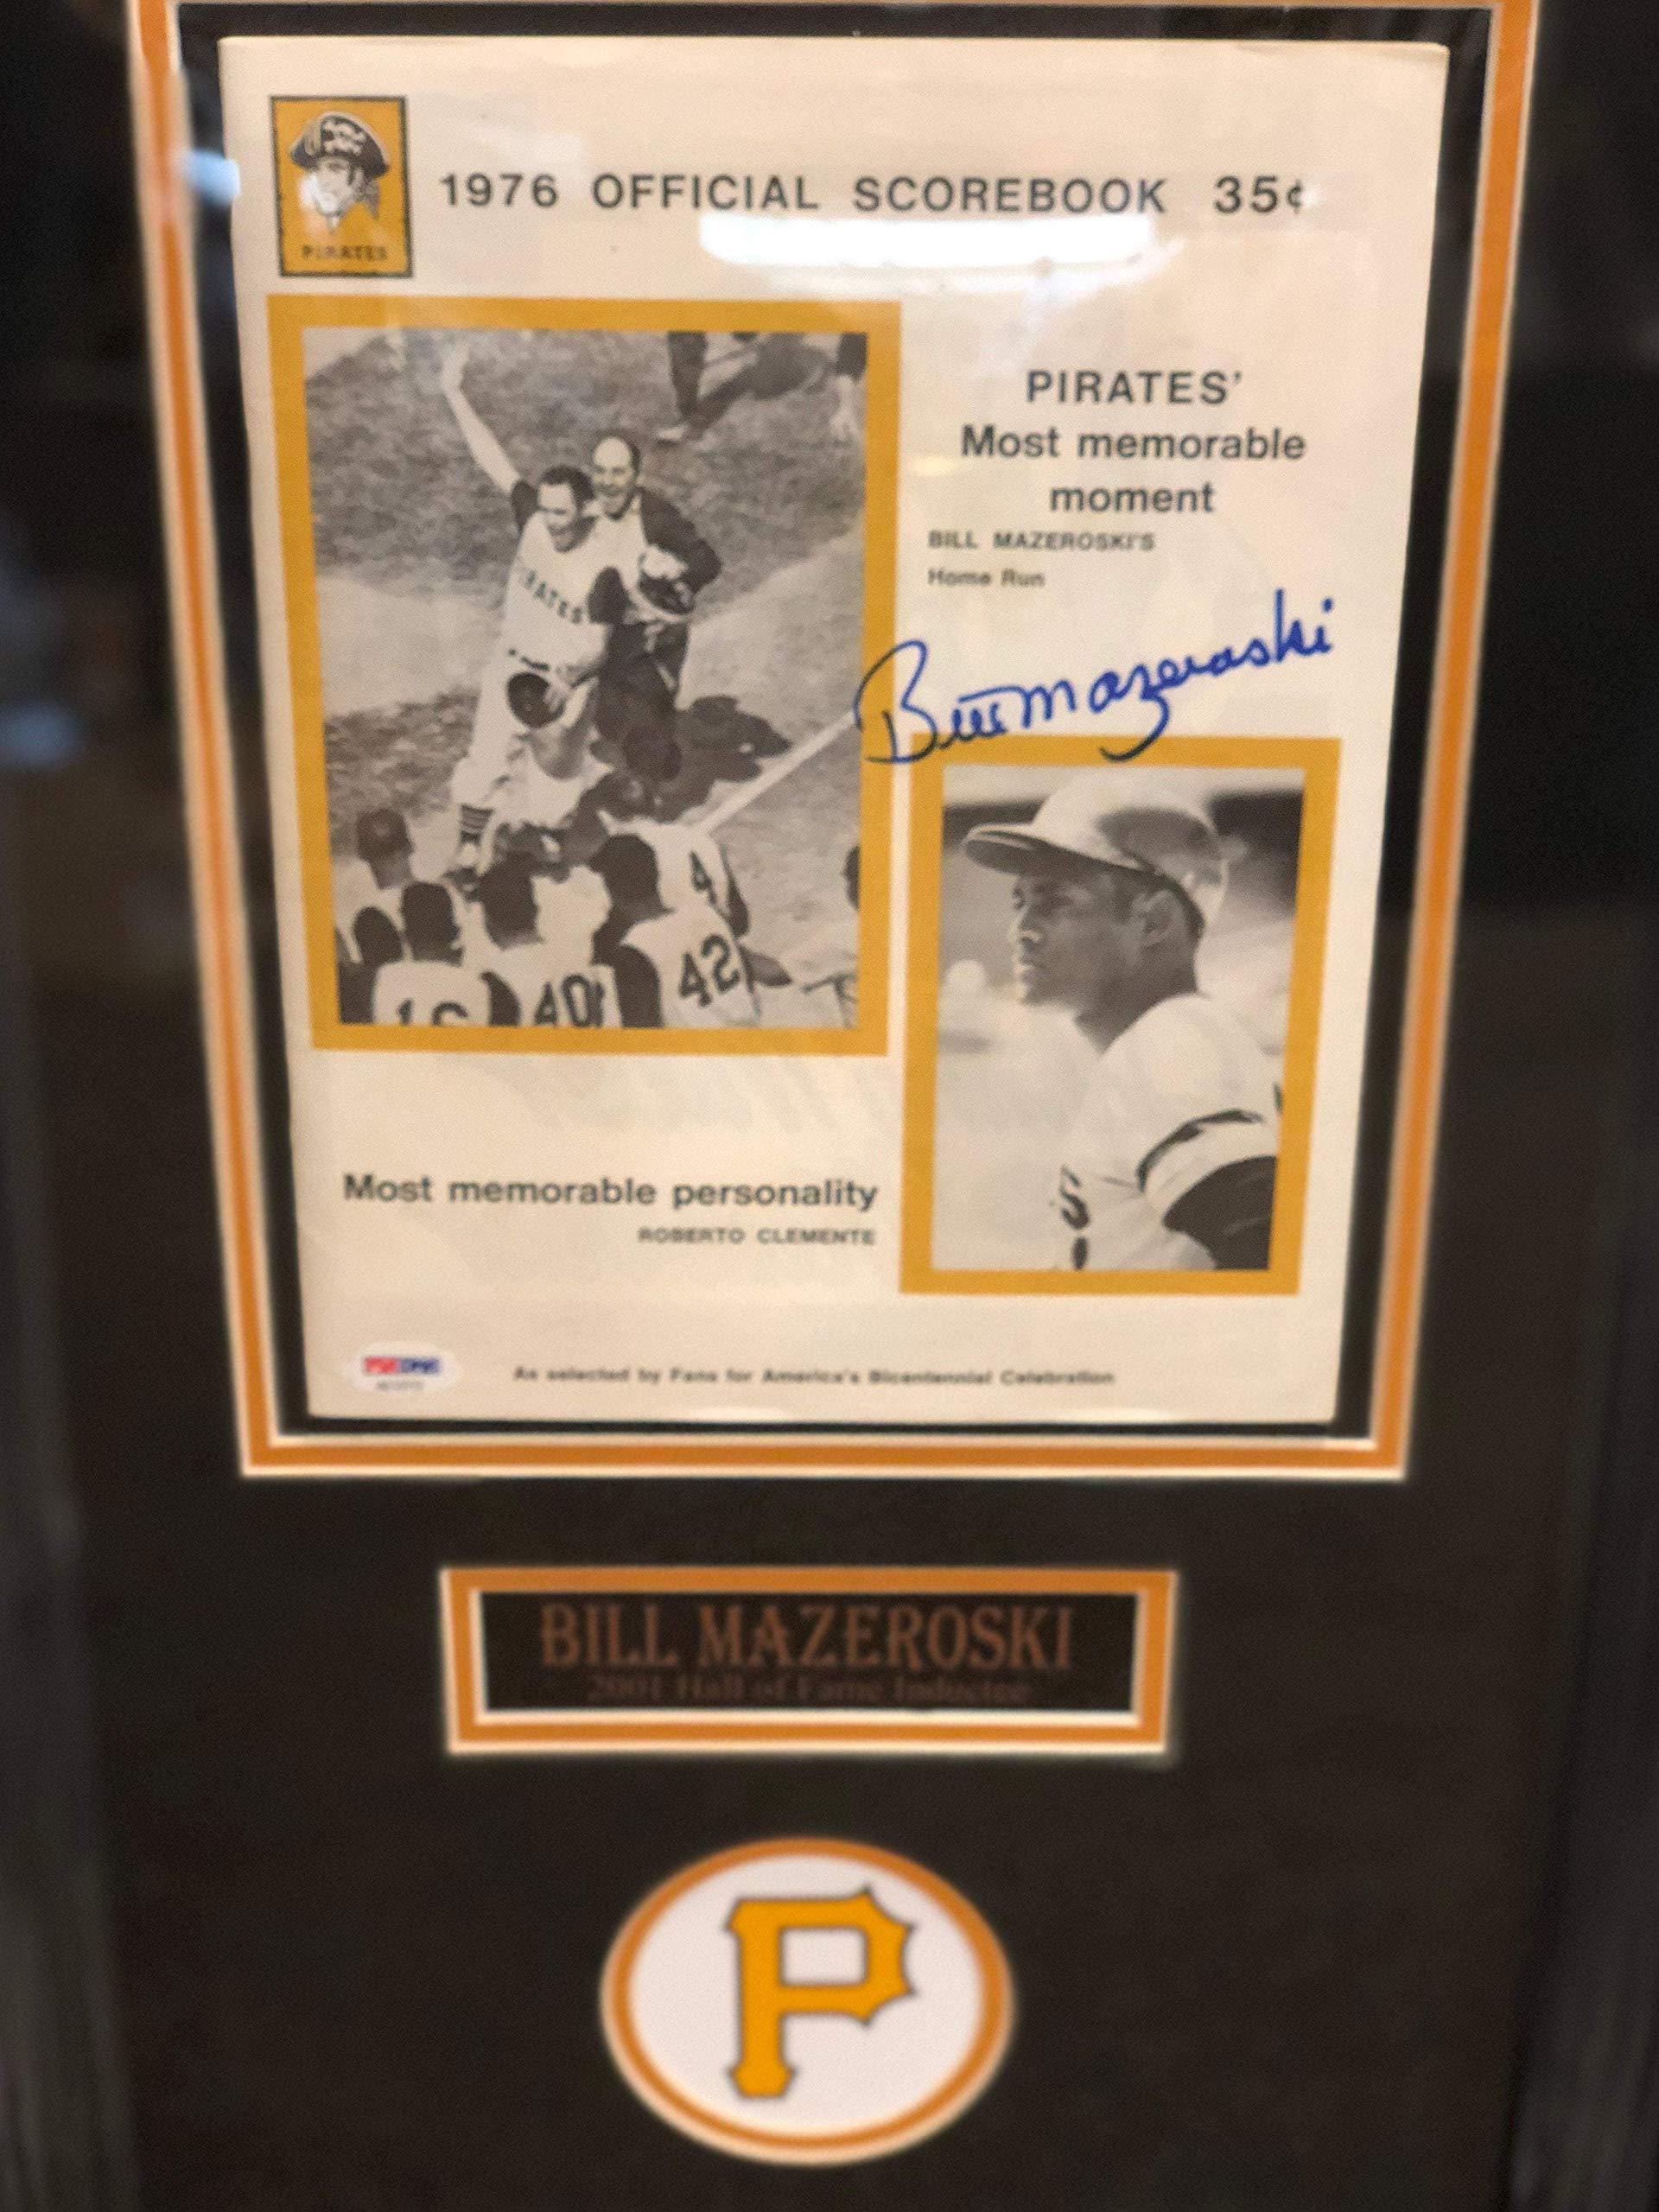 Total Sports Enterprises Bill Mazeroski Signed 1976 WS Scorebook Professionally Framed